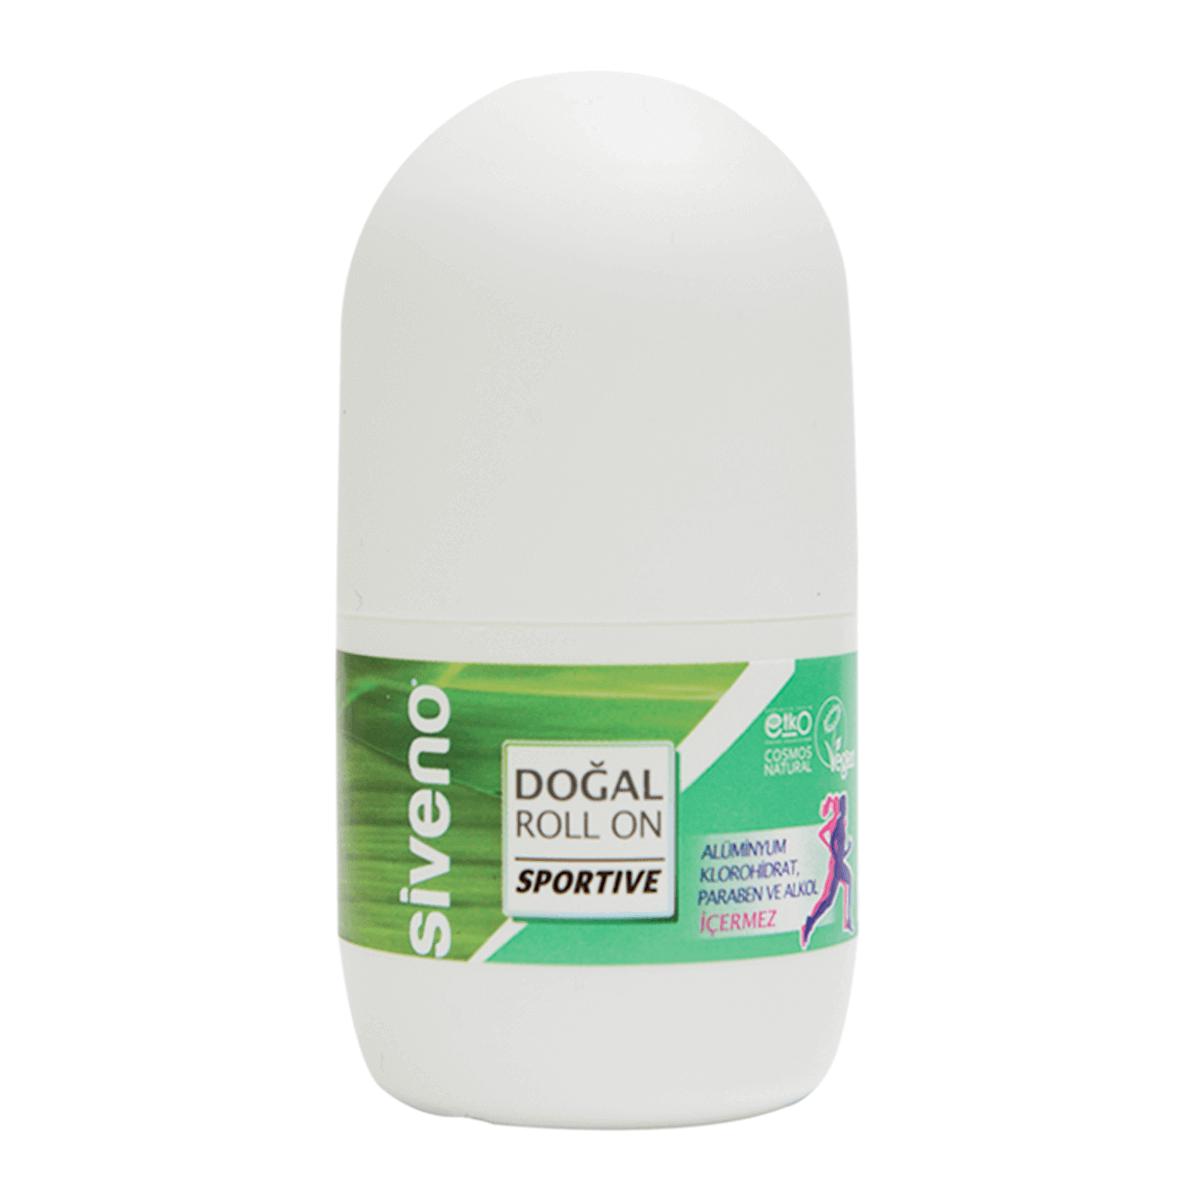 Doğal Roll-On Sportive 50 ml